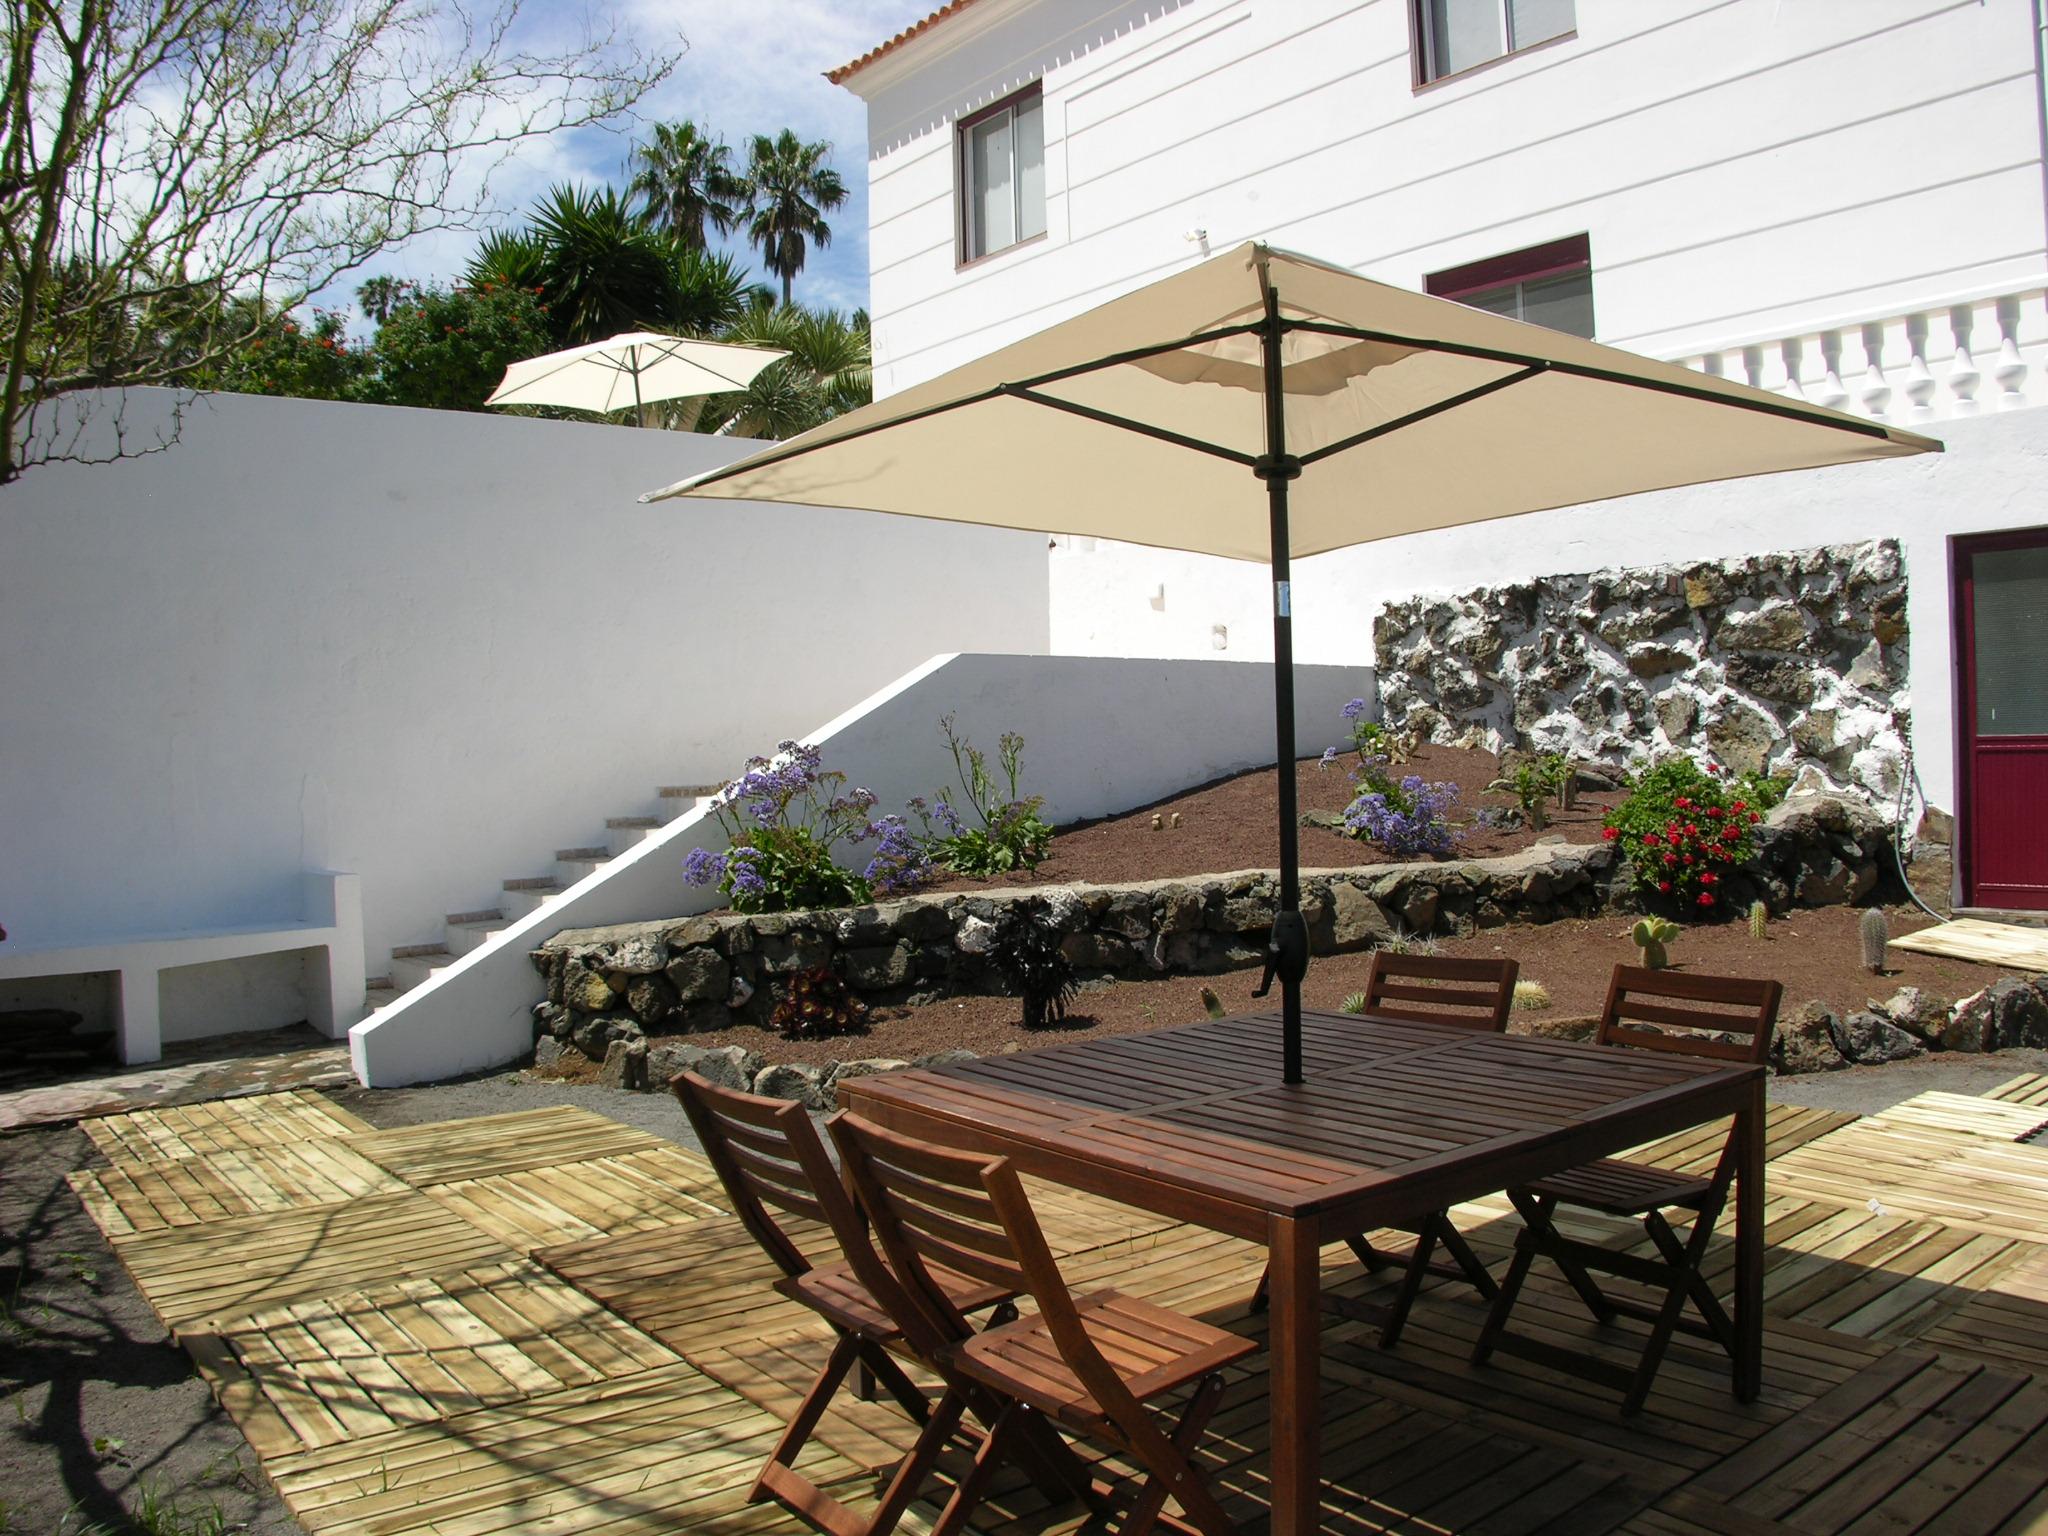 Maison de vacances Villa Vista La Quinta beheizbarer Pool kostenloses WLAN Grill (2124407), Santa Ursula, Ténérife, Iles Canaries, Espagne, image 7